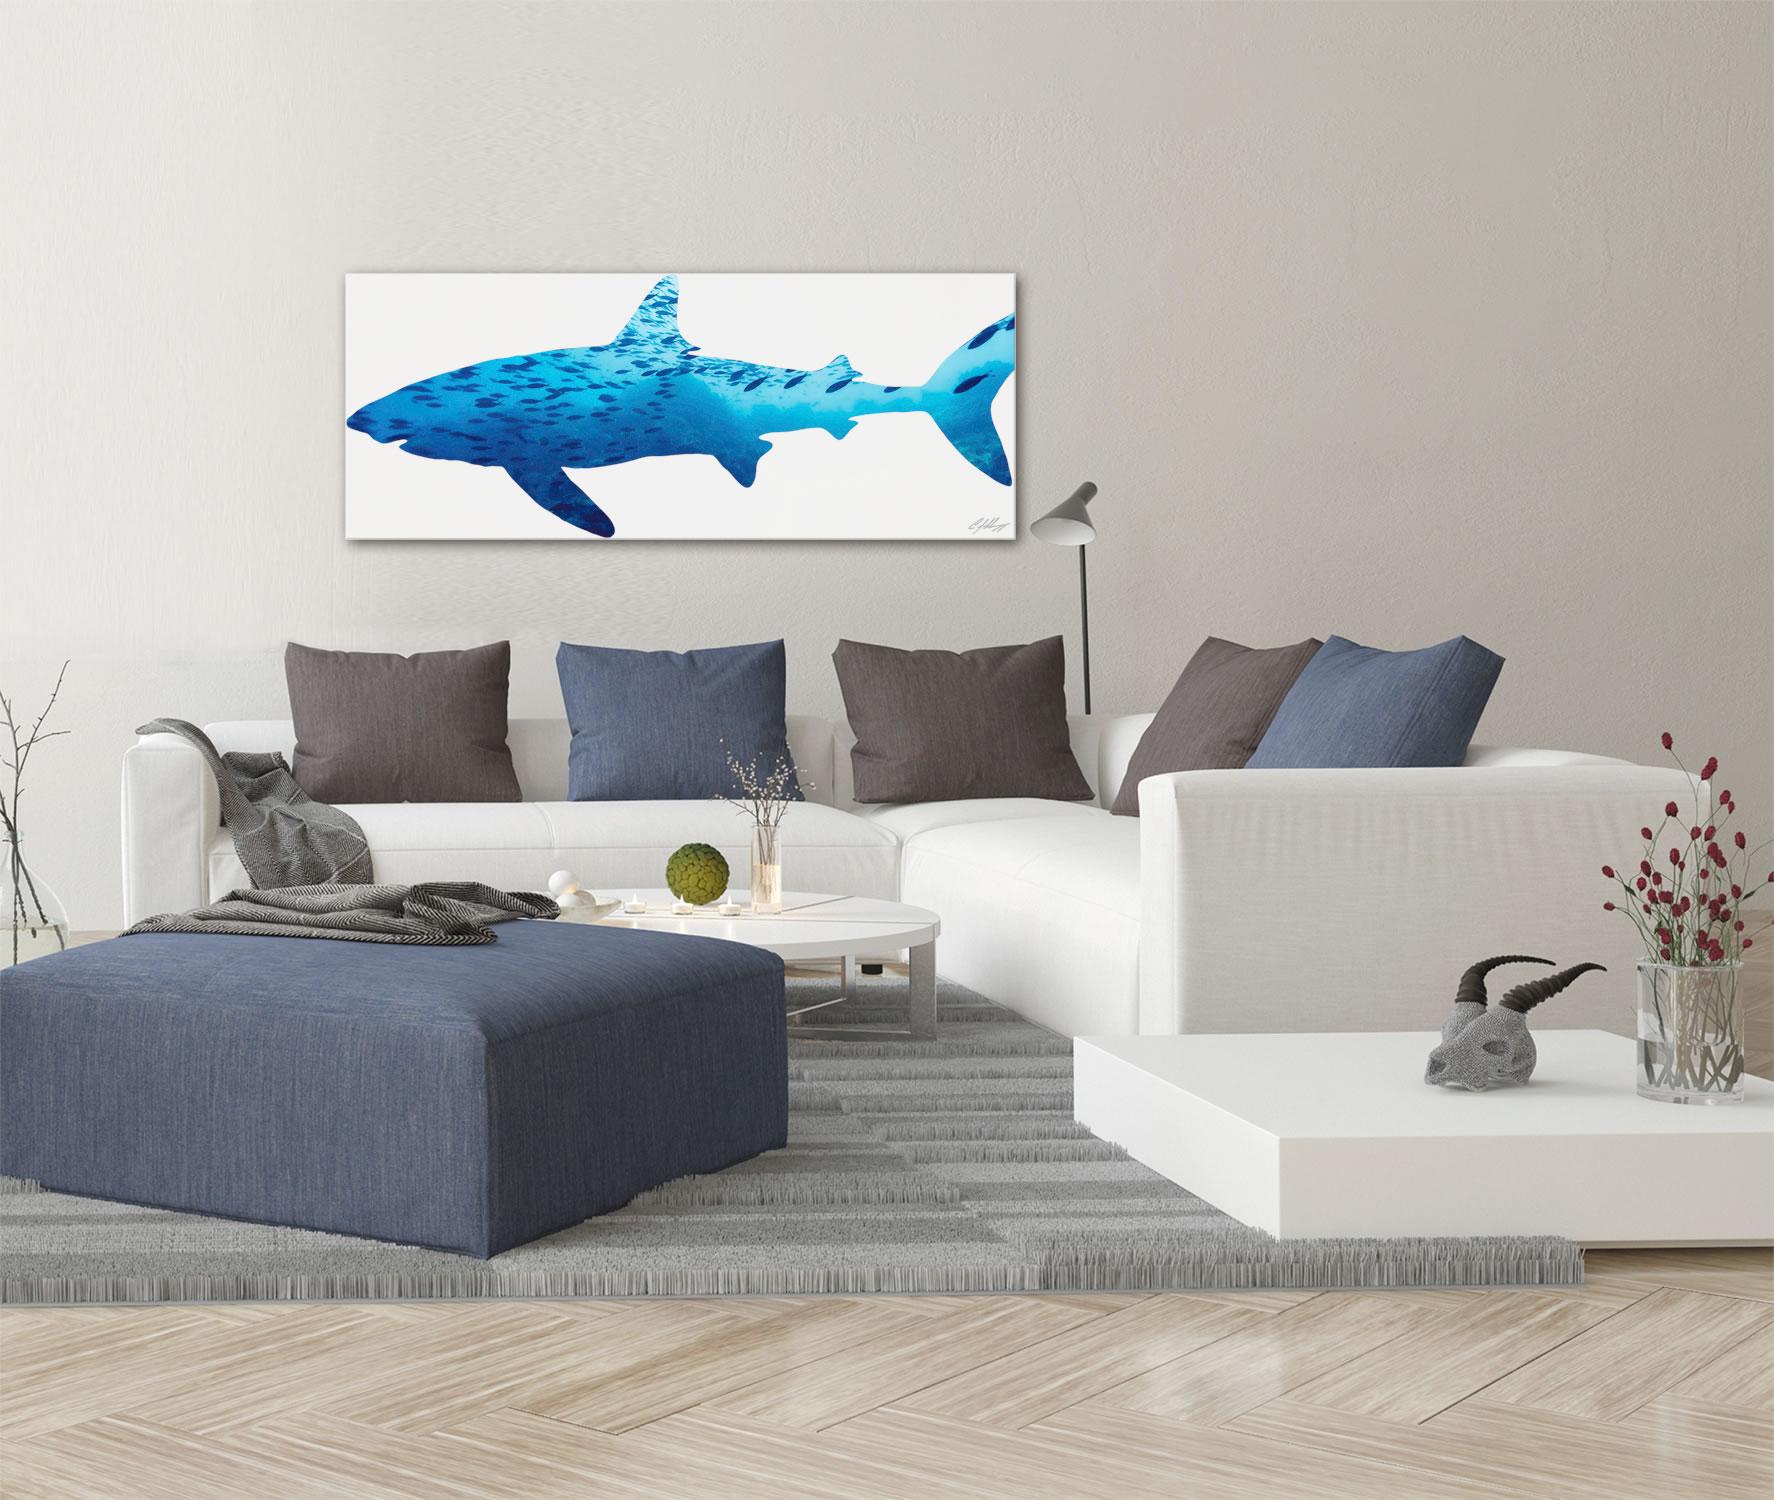 SHARK SEASCAPE - 48x19 in. Metal Animal Print - Lifestyle Image